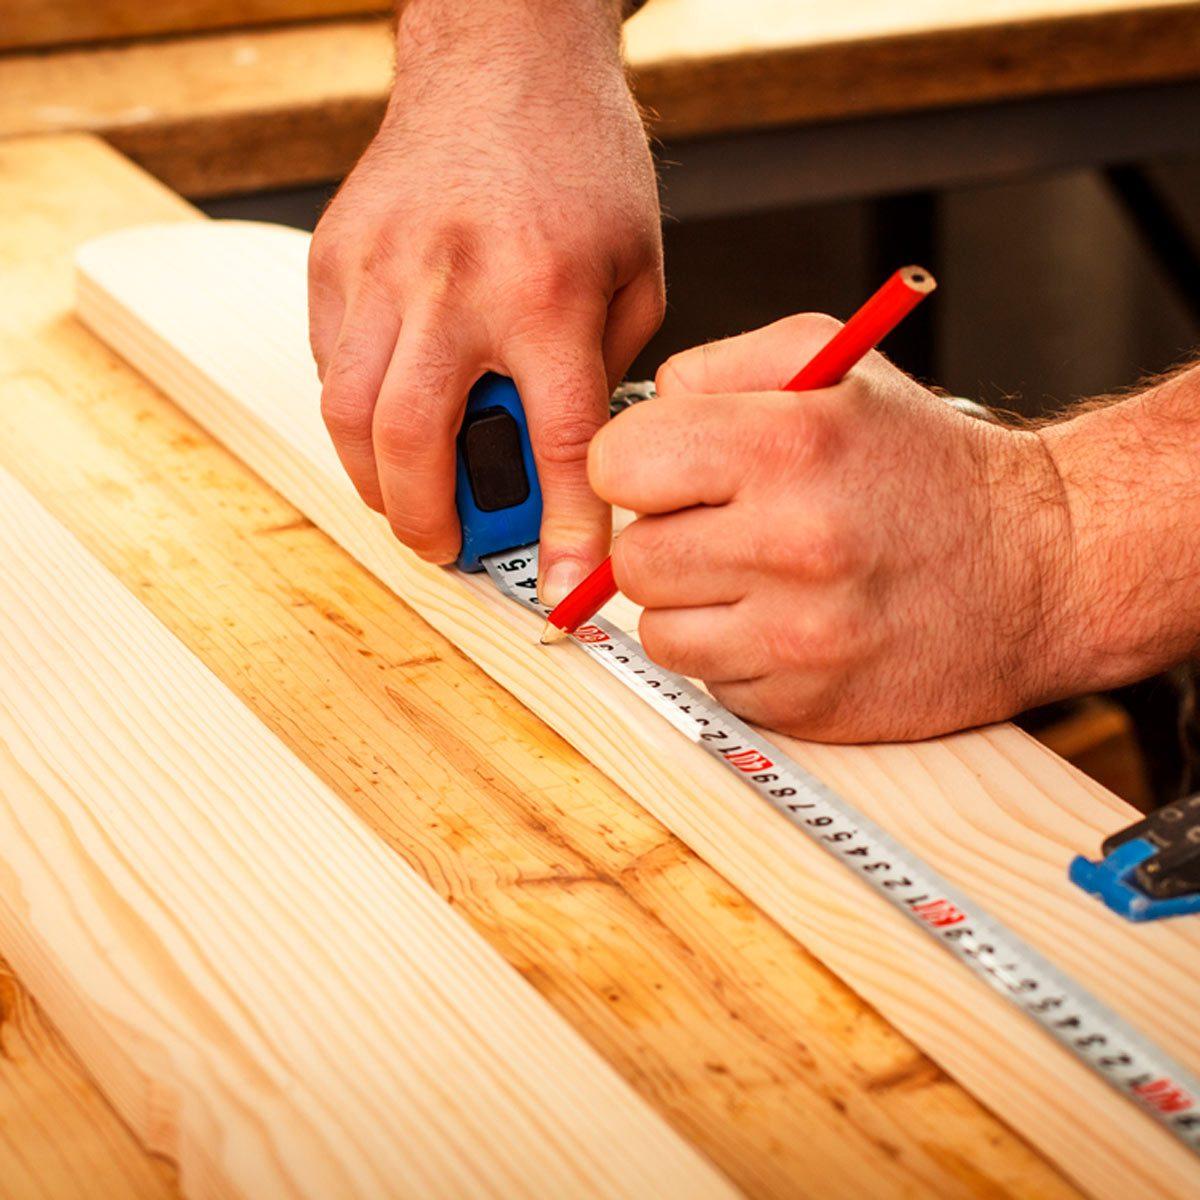 20 marking hacks every diyer should know | family handyman